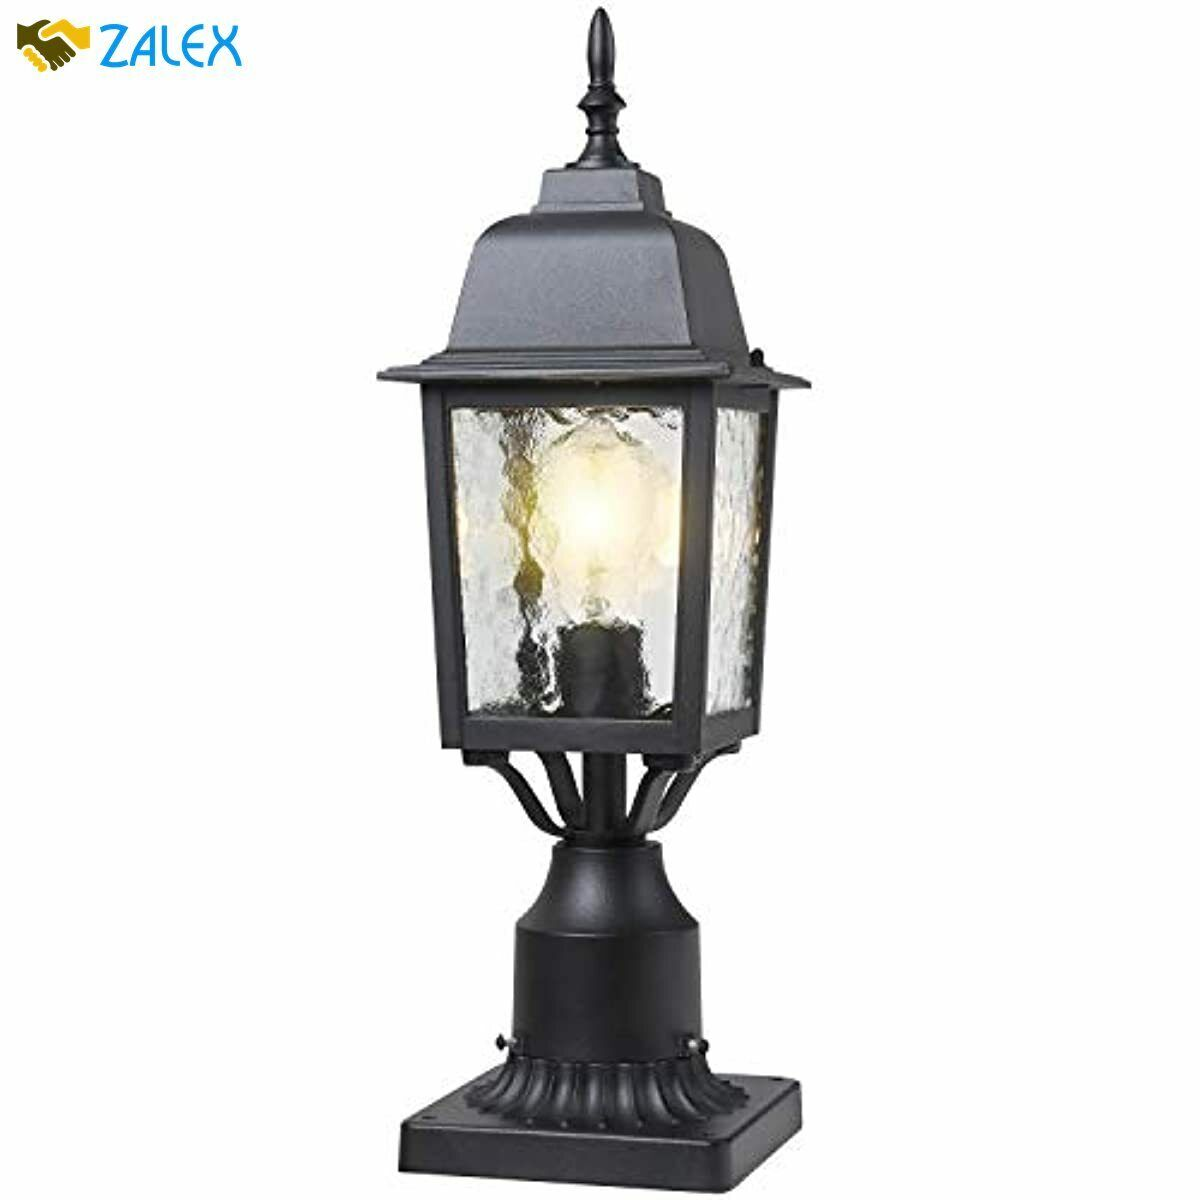 Outdoor Black Post Lantern Exterior Light Post Lighting Pillar Lamp Garden Decor